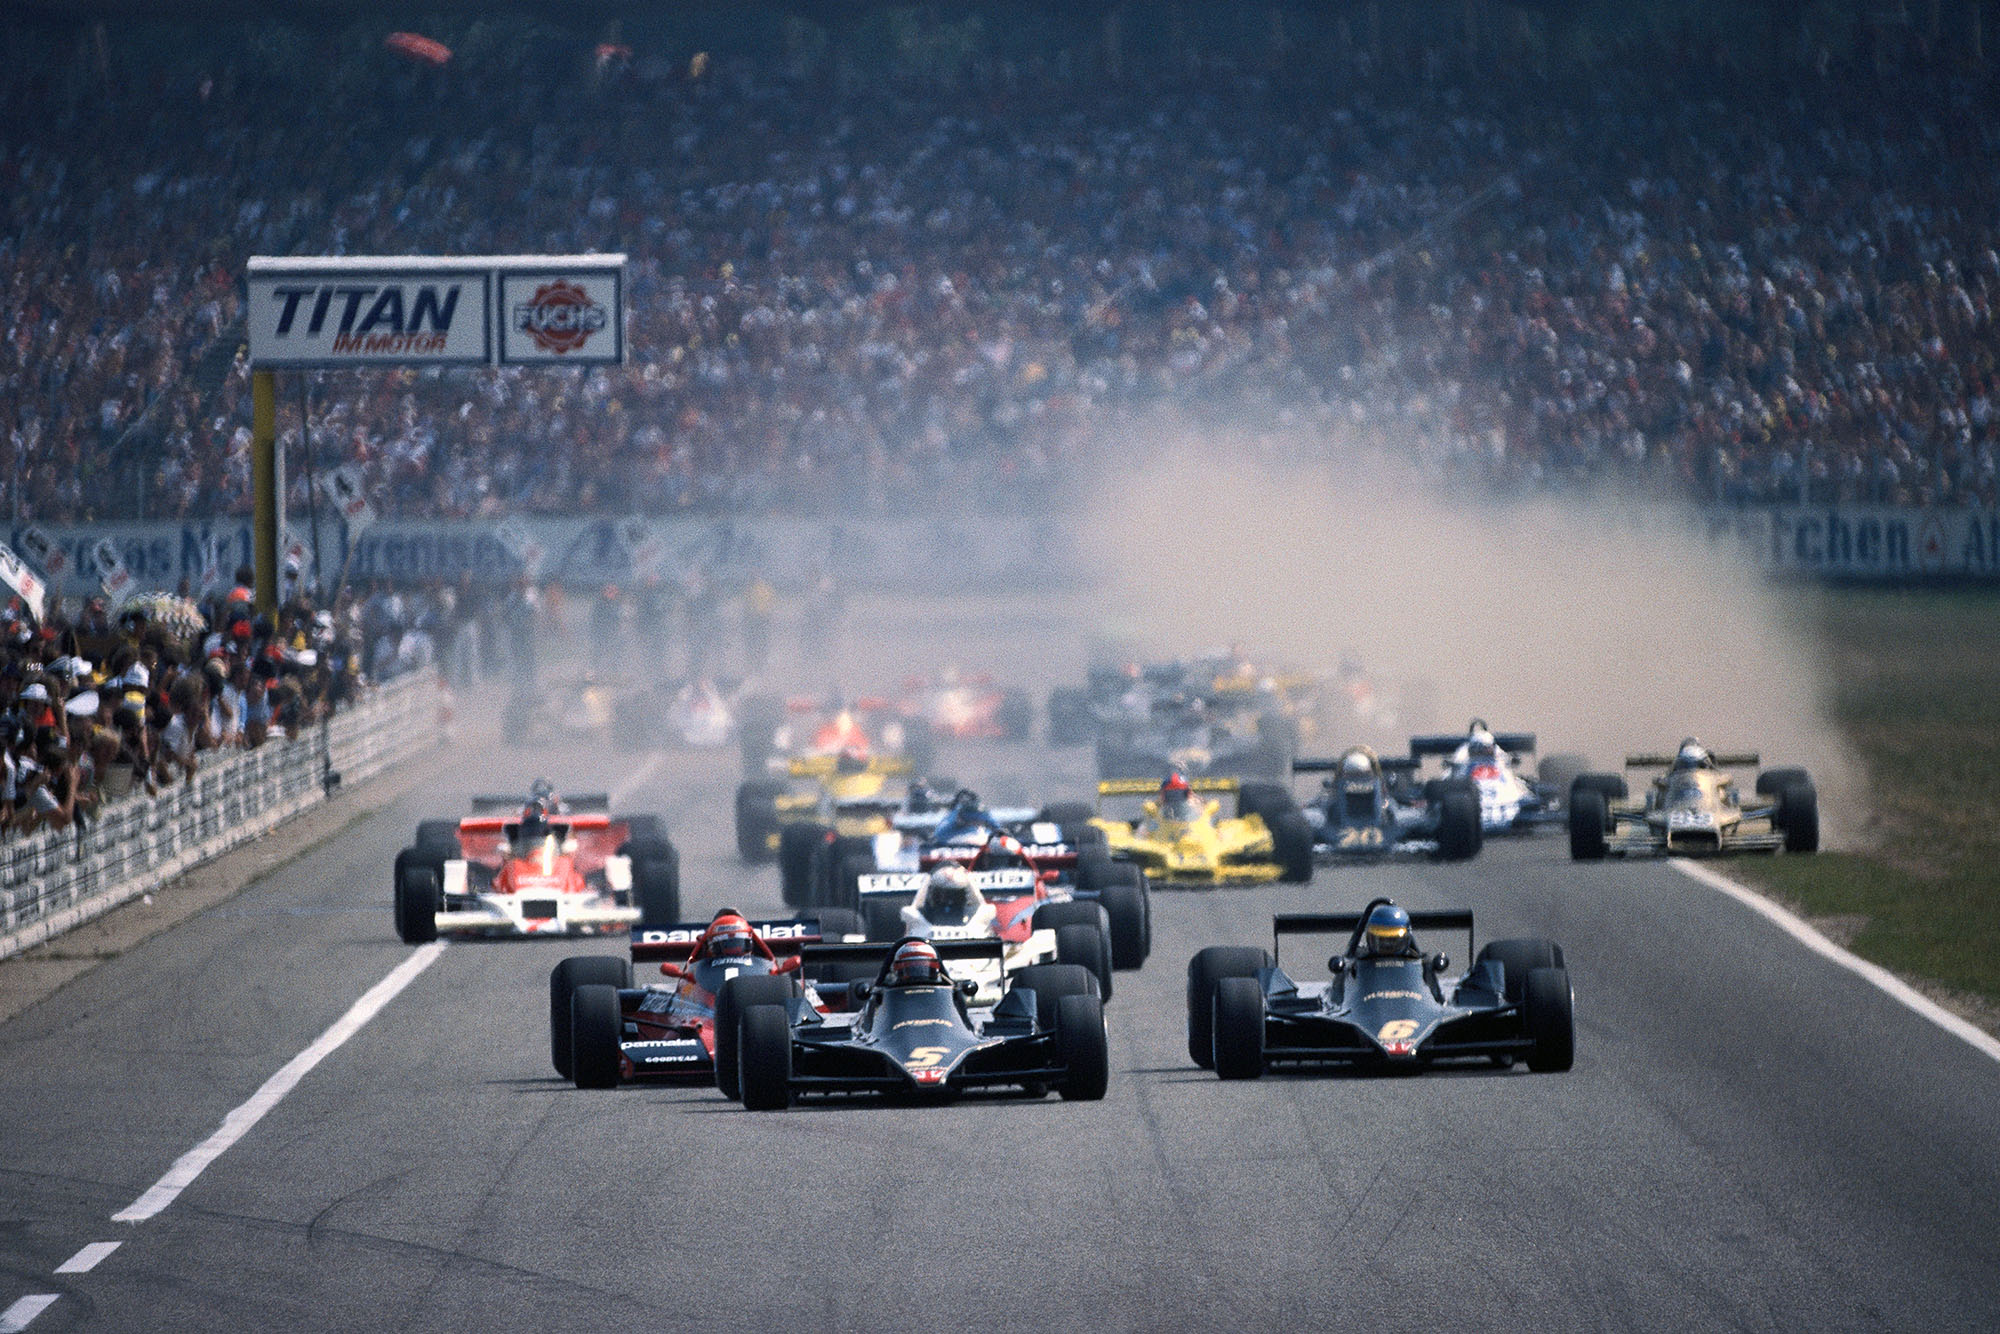 The 1977 German Grand Prix gets underway as the cars leave the grid, Hockenheim.